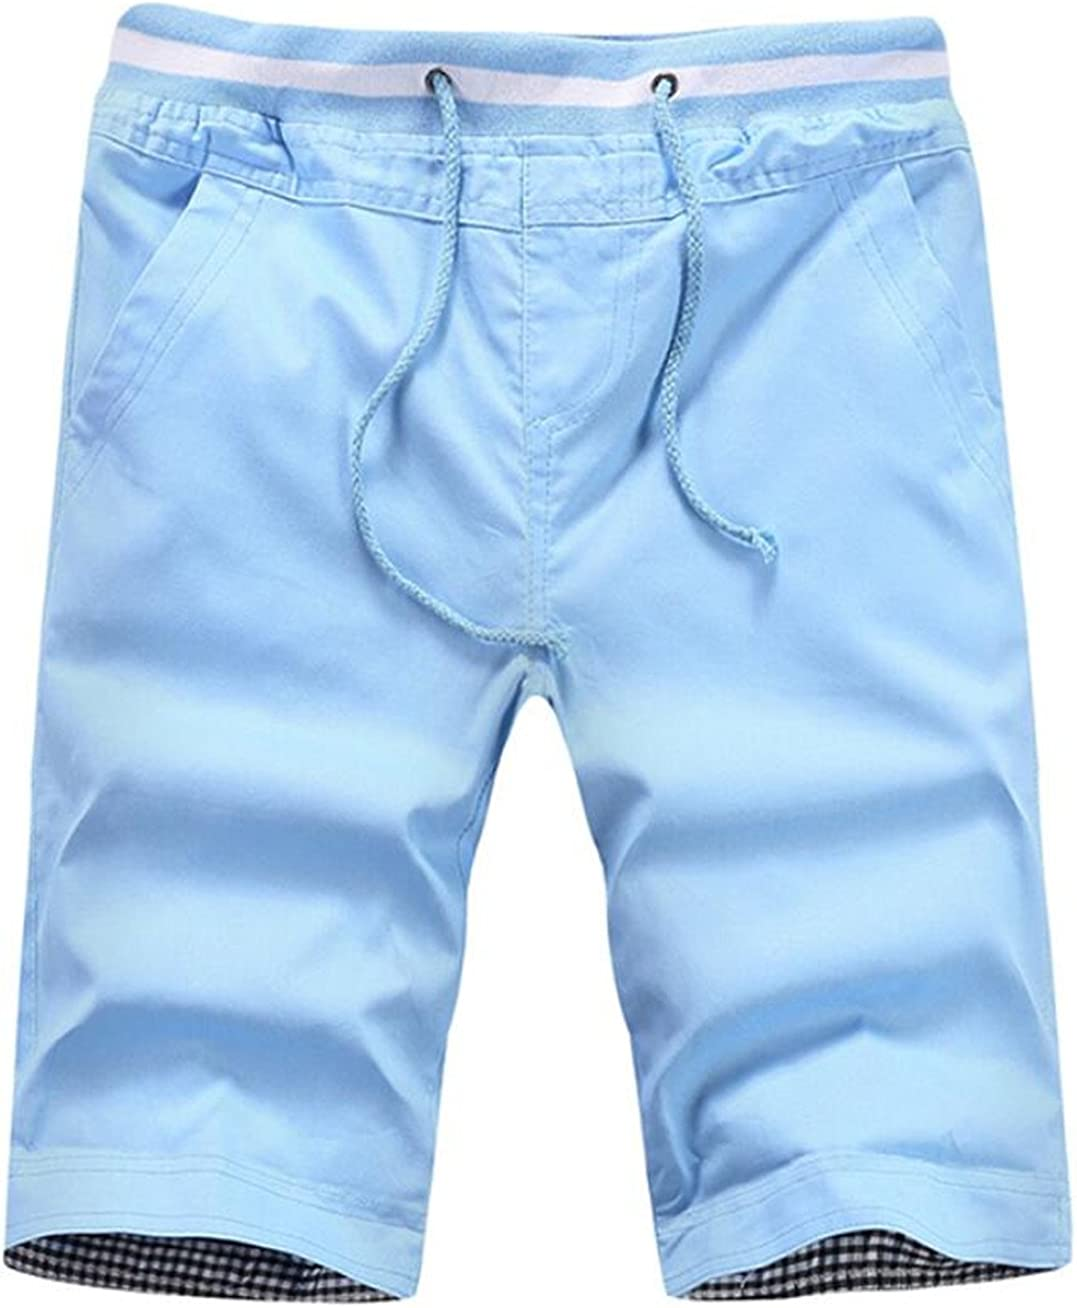 KLJR-Men Summer Flat Front Shorts Casual Cotton Slim Fit Chino Shorts Lake Blue US 3XL